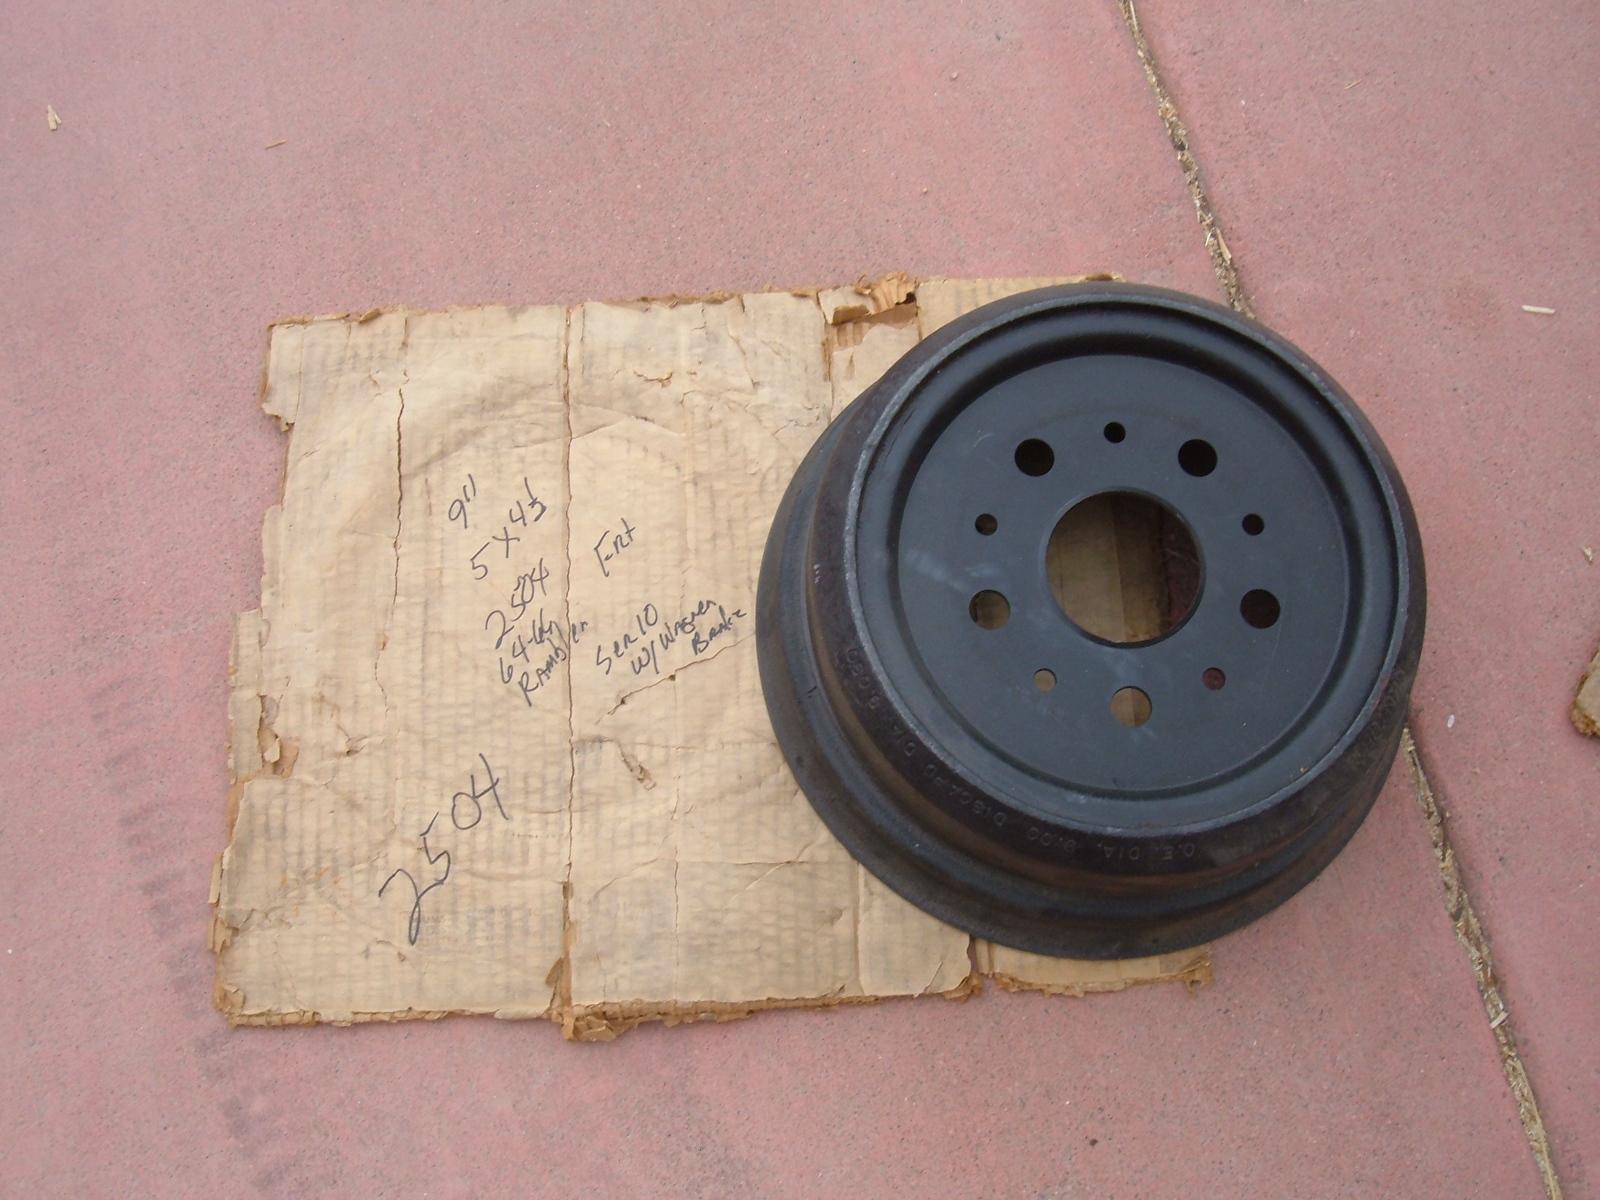 1964 65 66 rambler front brake drum new # 2504 (z 2504)